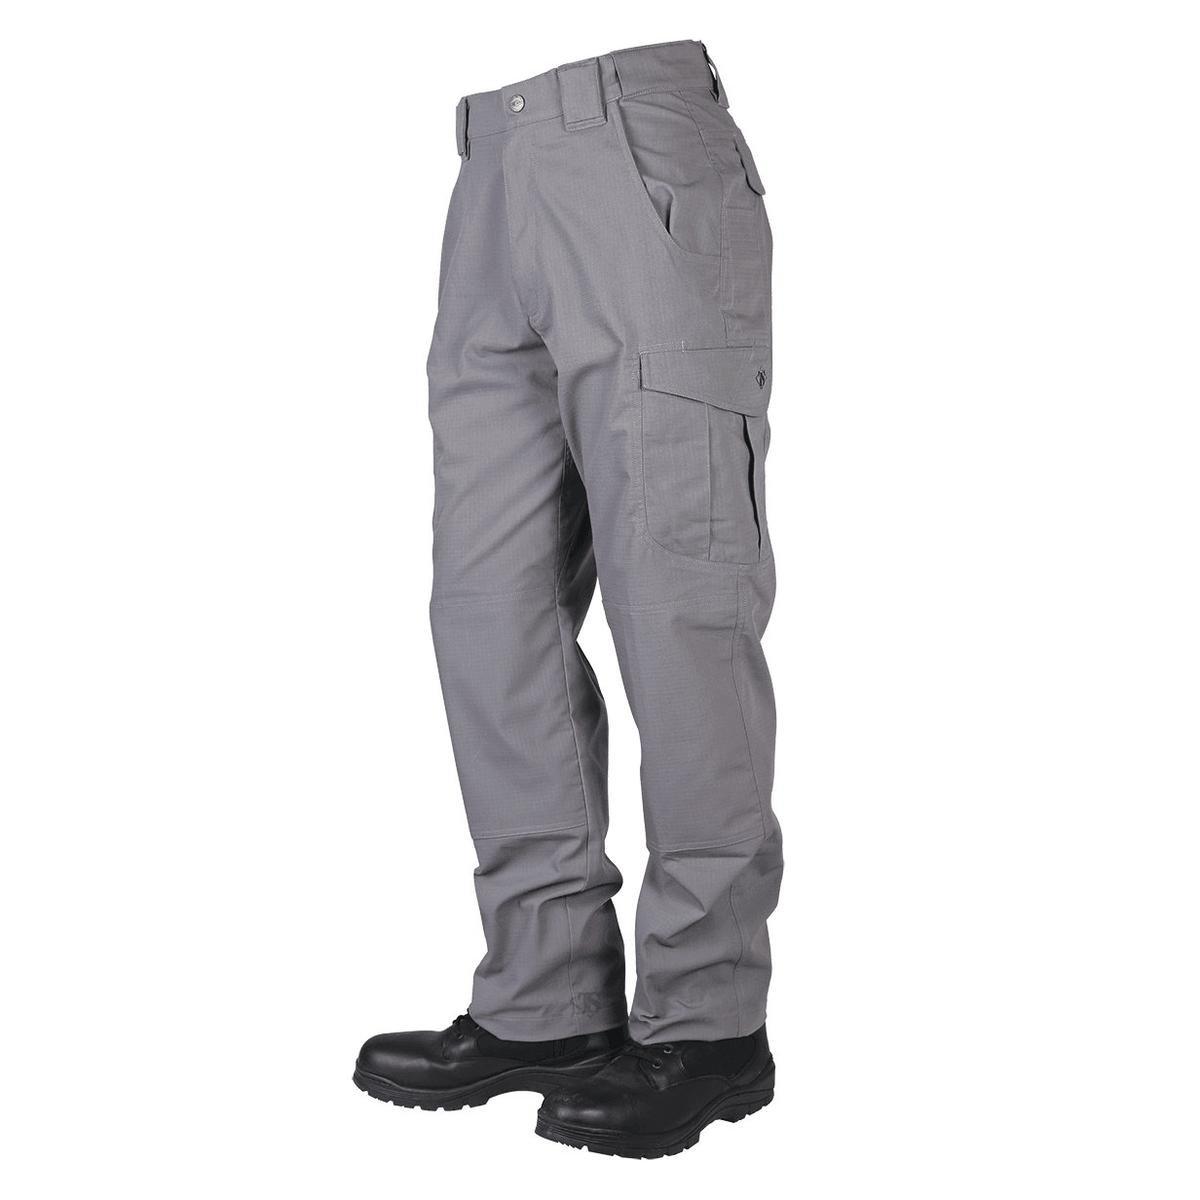 TRU-SPEC Men's Pants, 24-7 Ascent, Light Grey, W: 28'' x L: Unhemmed